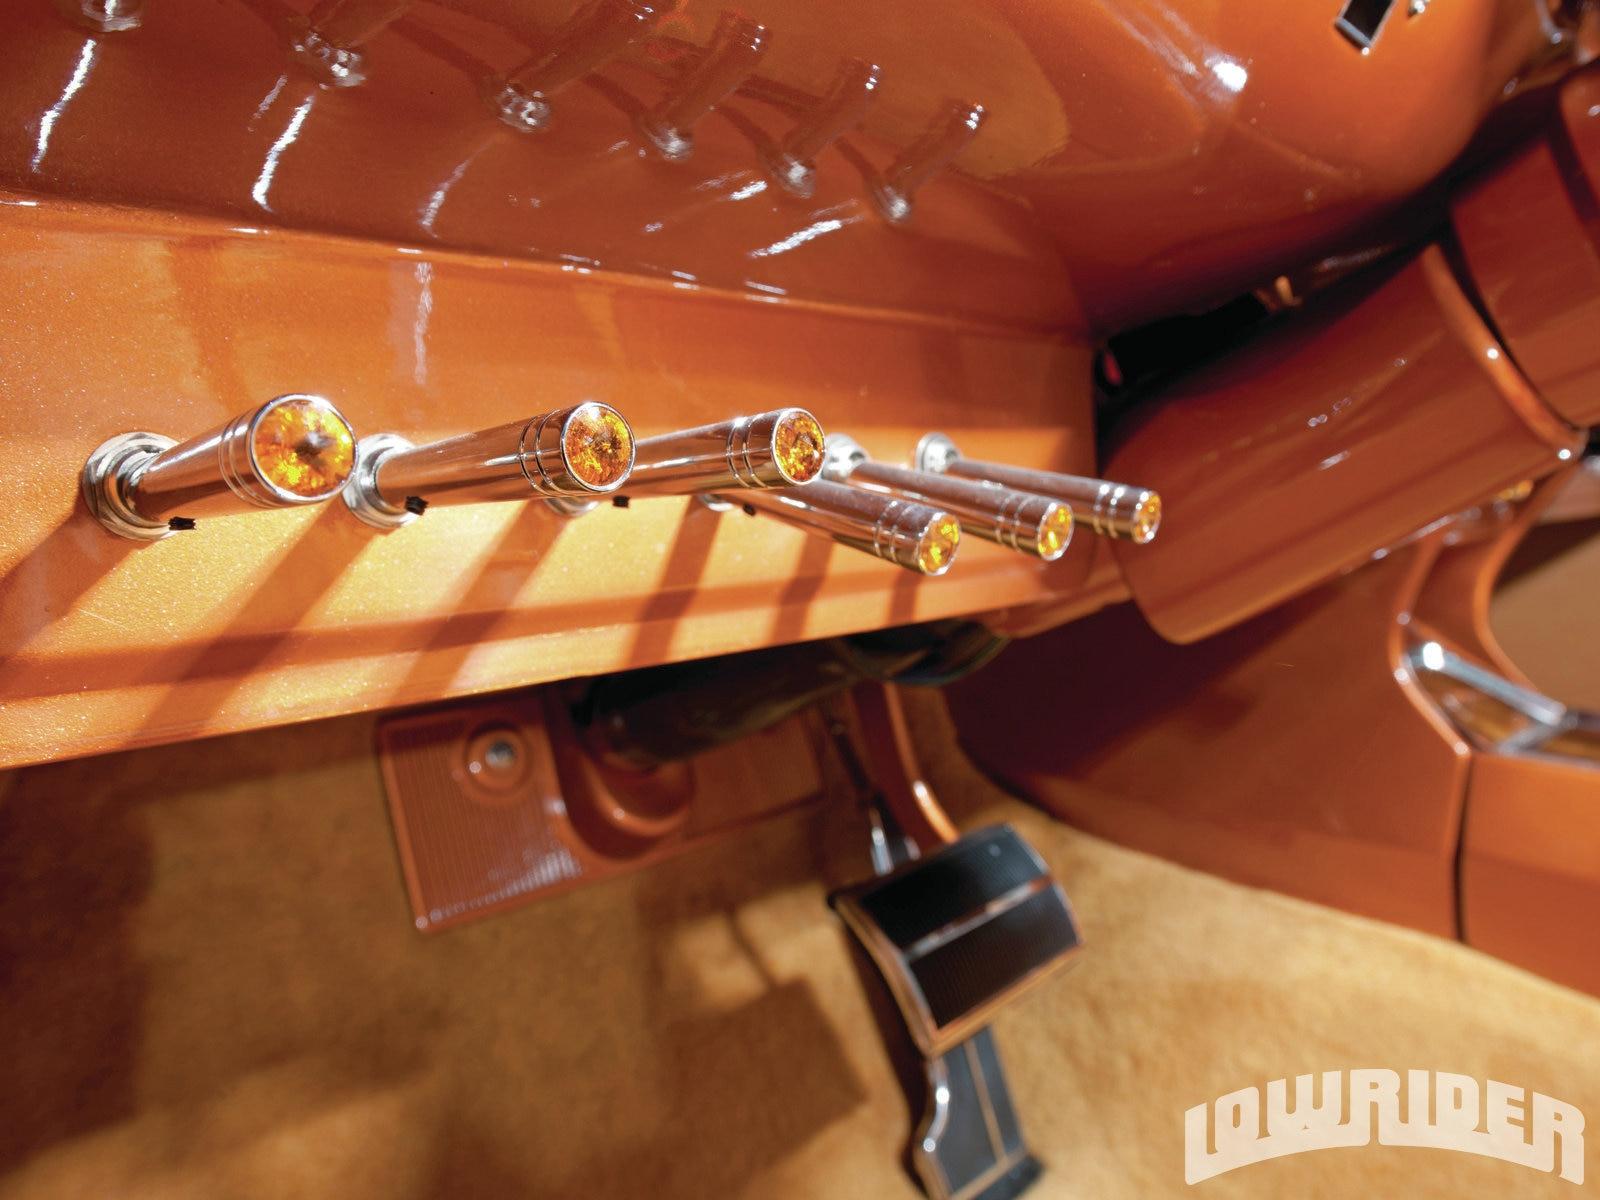 1967 Chevrolet Impala Convertible Supersport - Lowrider ...